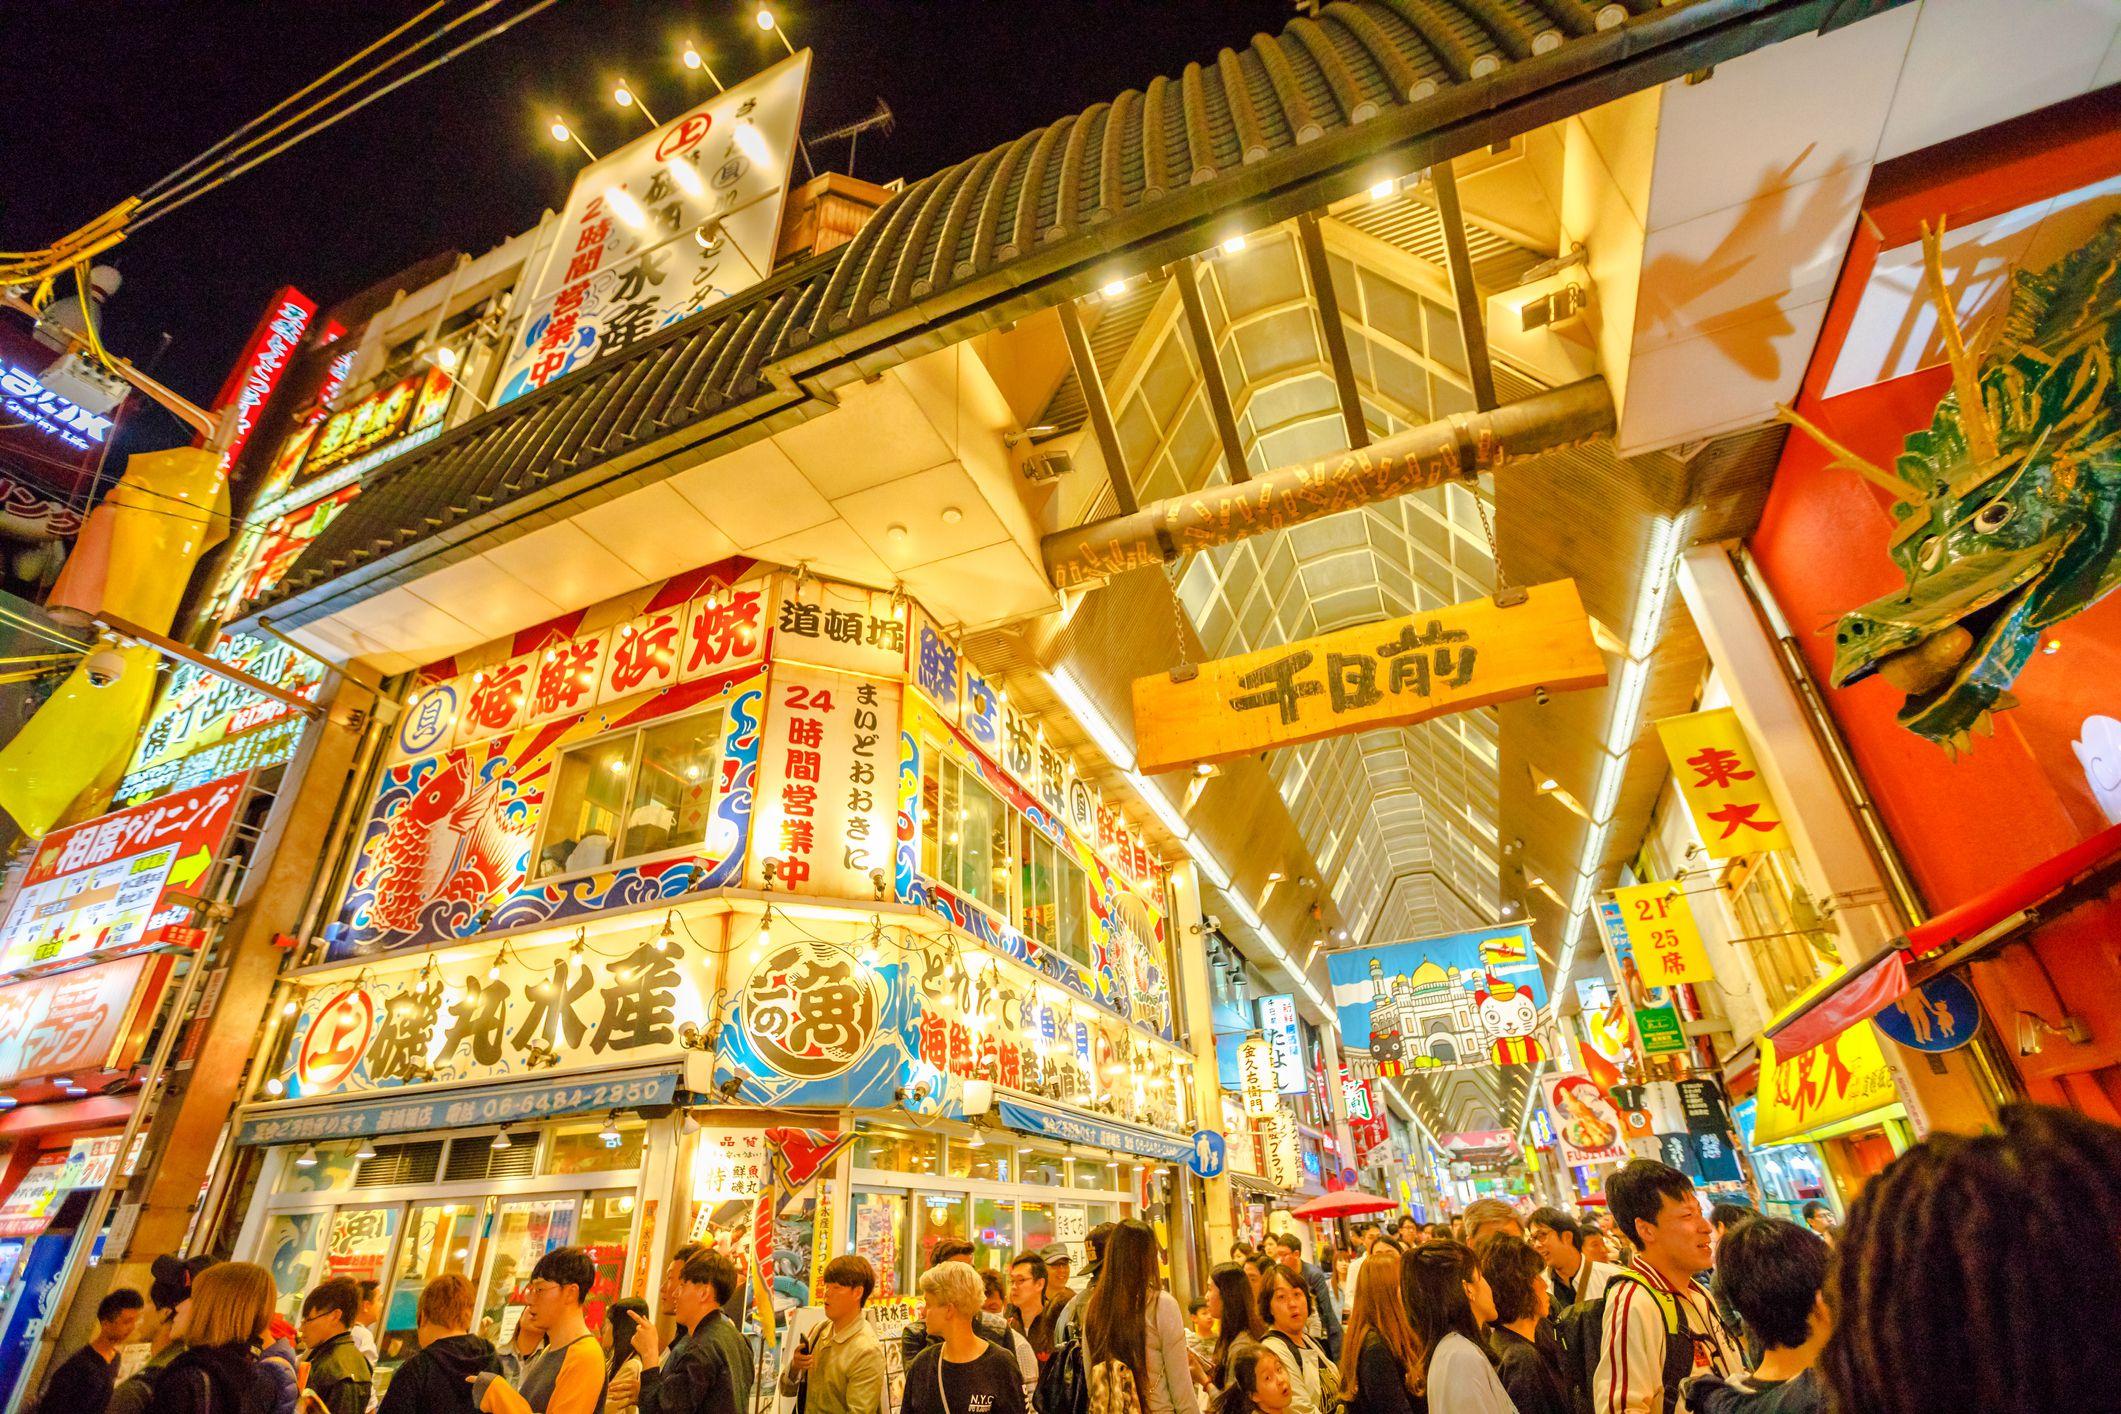 Osaka Golden Week crowd and lit-up shops